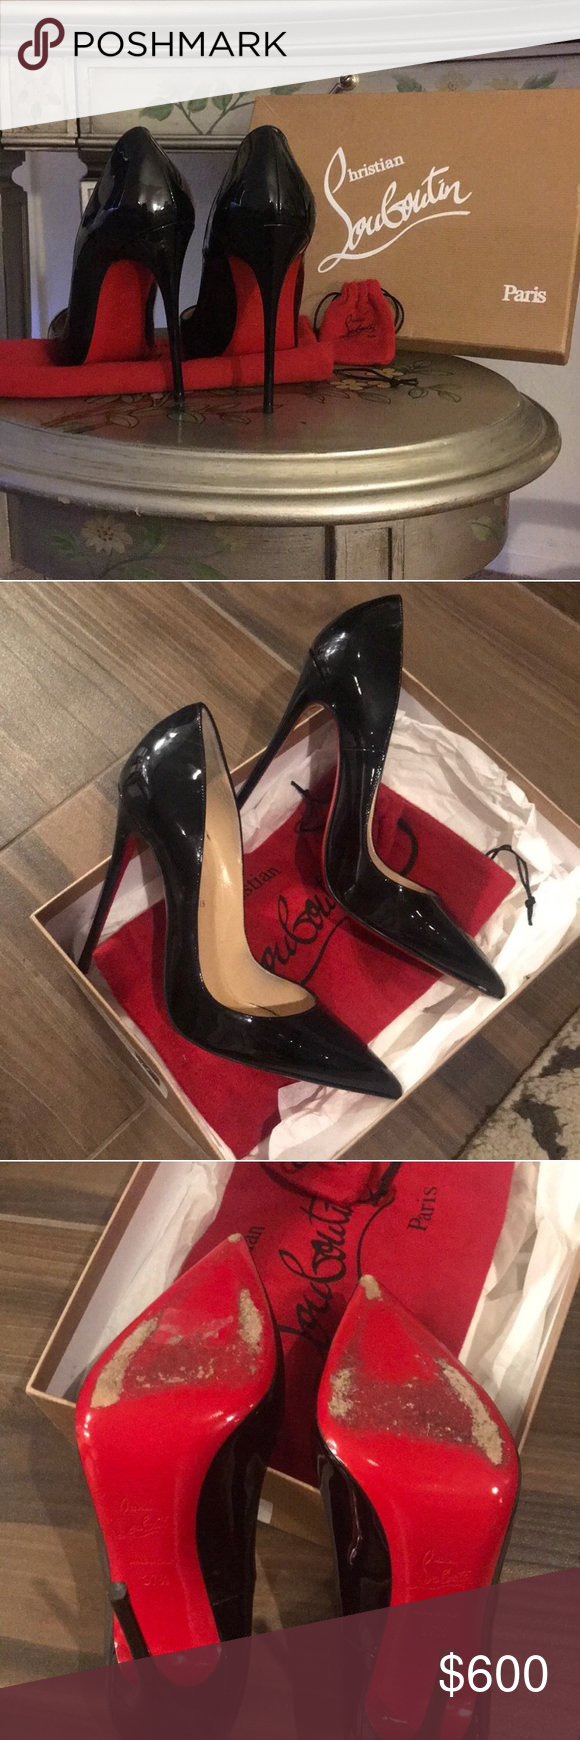 6a50aa2c49 Christian Louboutin So Kate Christian Louboutin So Kate 120mm Black Patent  Leather Size 37.5. Beautiful